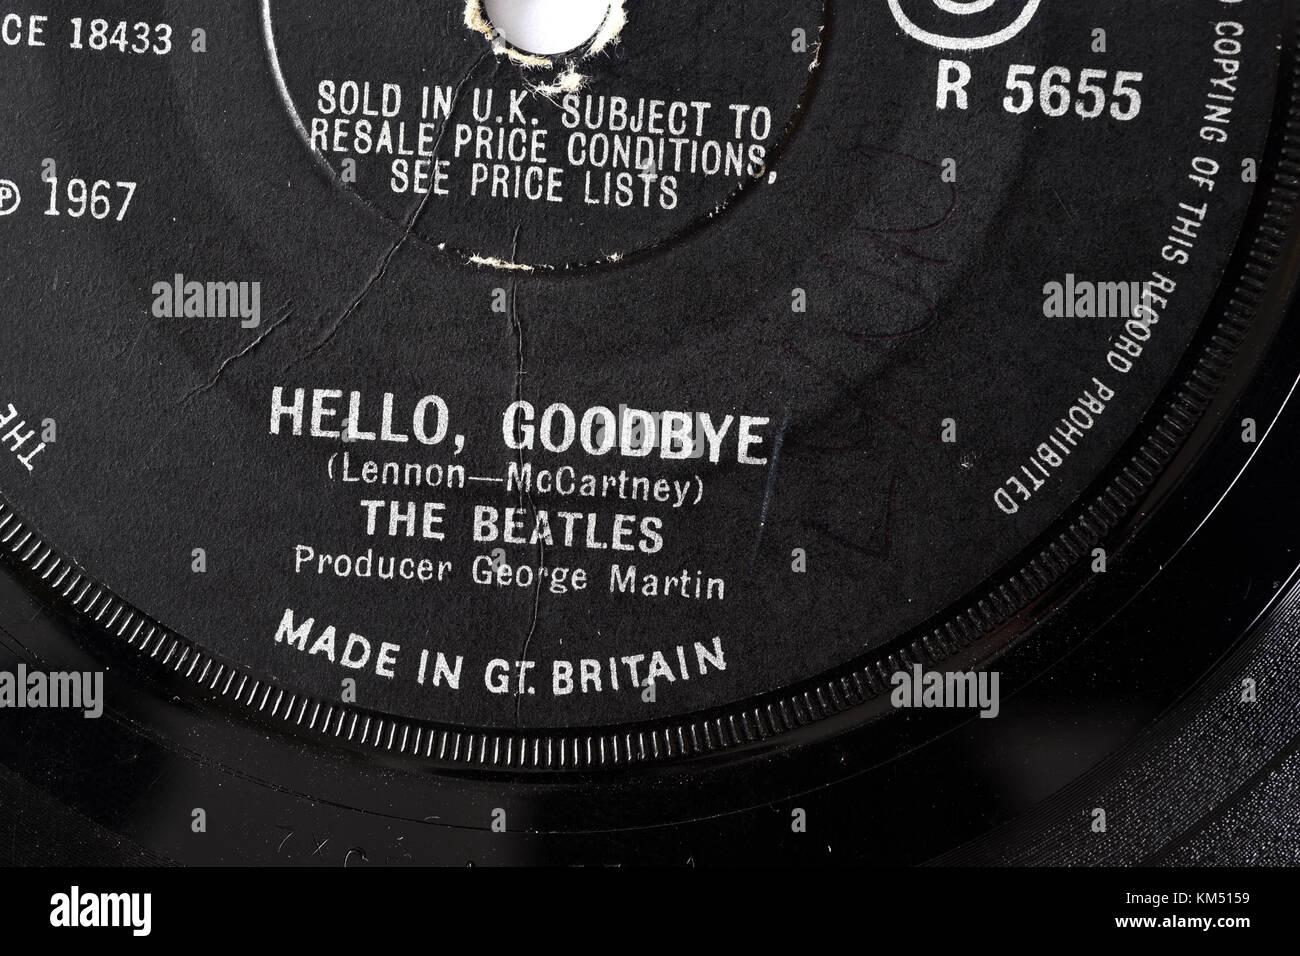 Beatles Hello Goodbye seven inch single label details - Stock Image